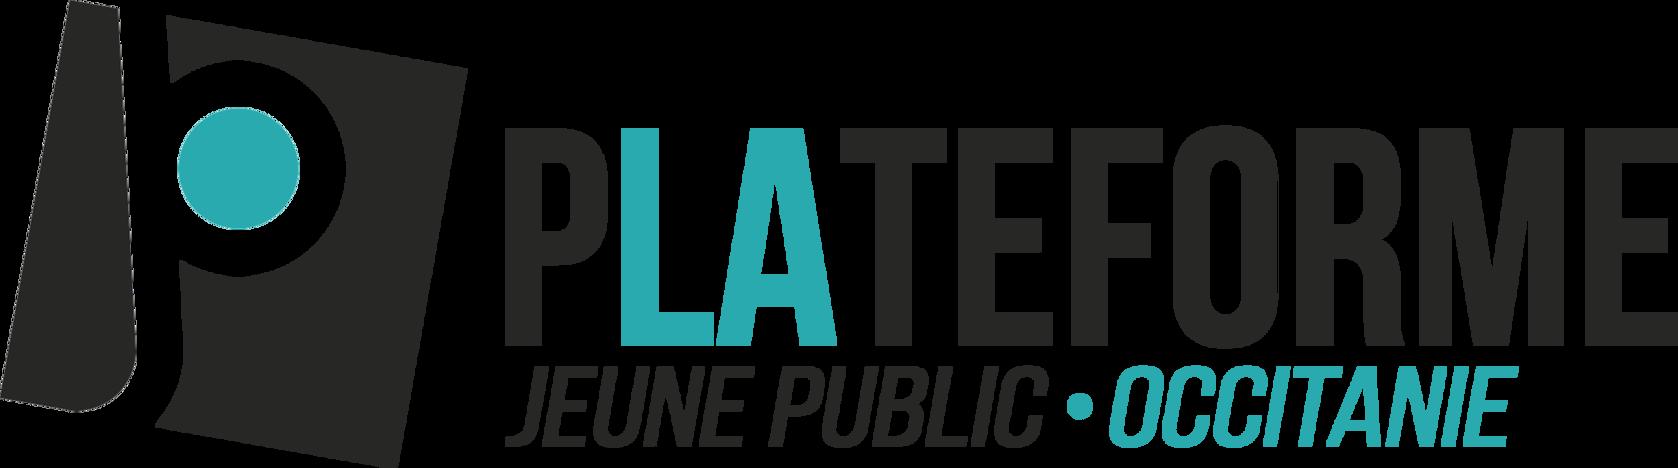 Plateforme Occitanie Jeune Public